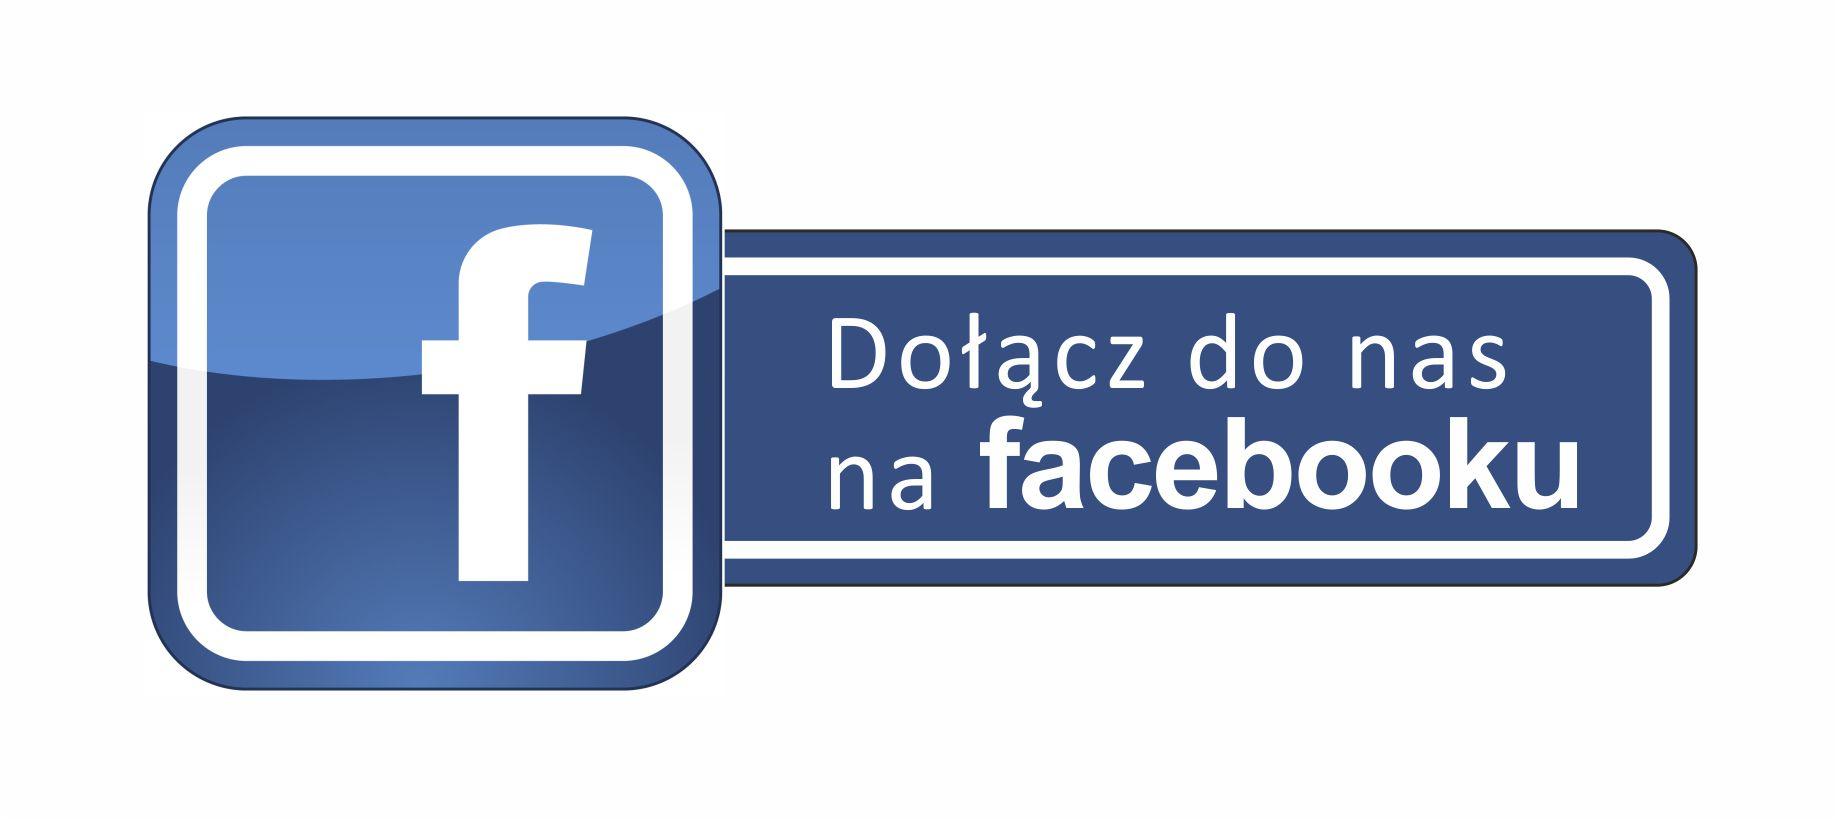 www.facebook.pl/osk.automoto.szkolenia